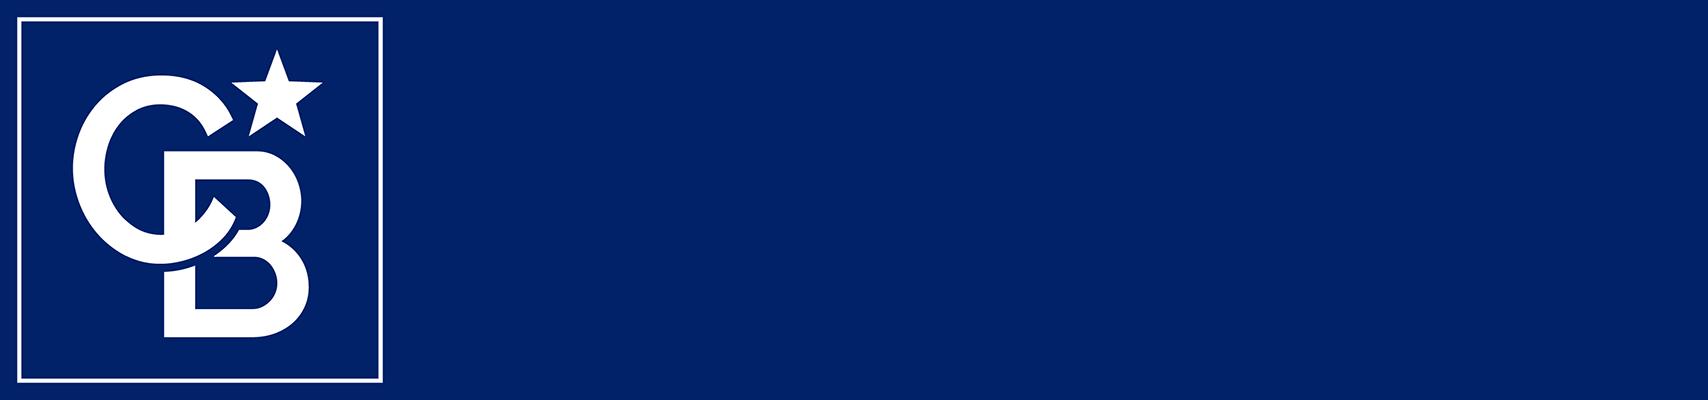 Gerri McKinley - Coldwell Banker Coastal Rivers Logo